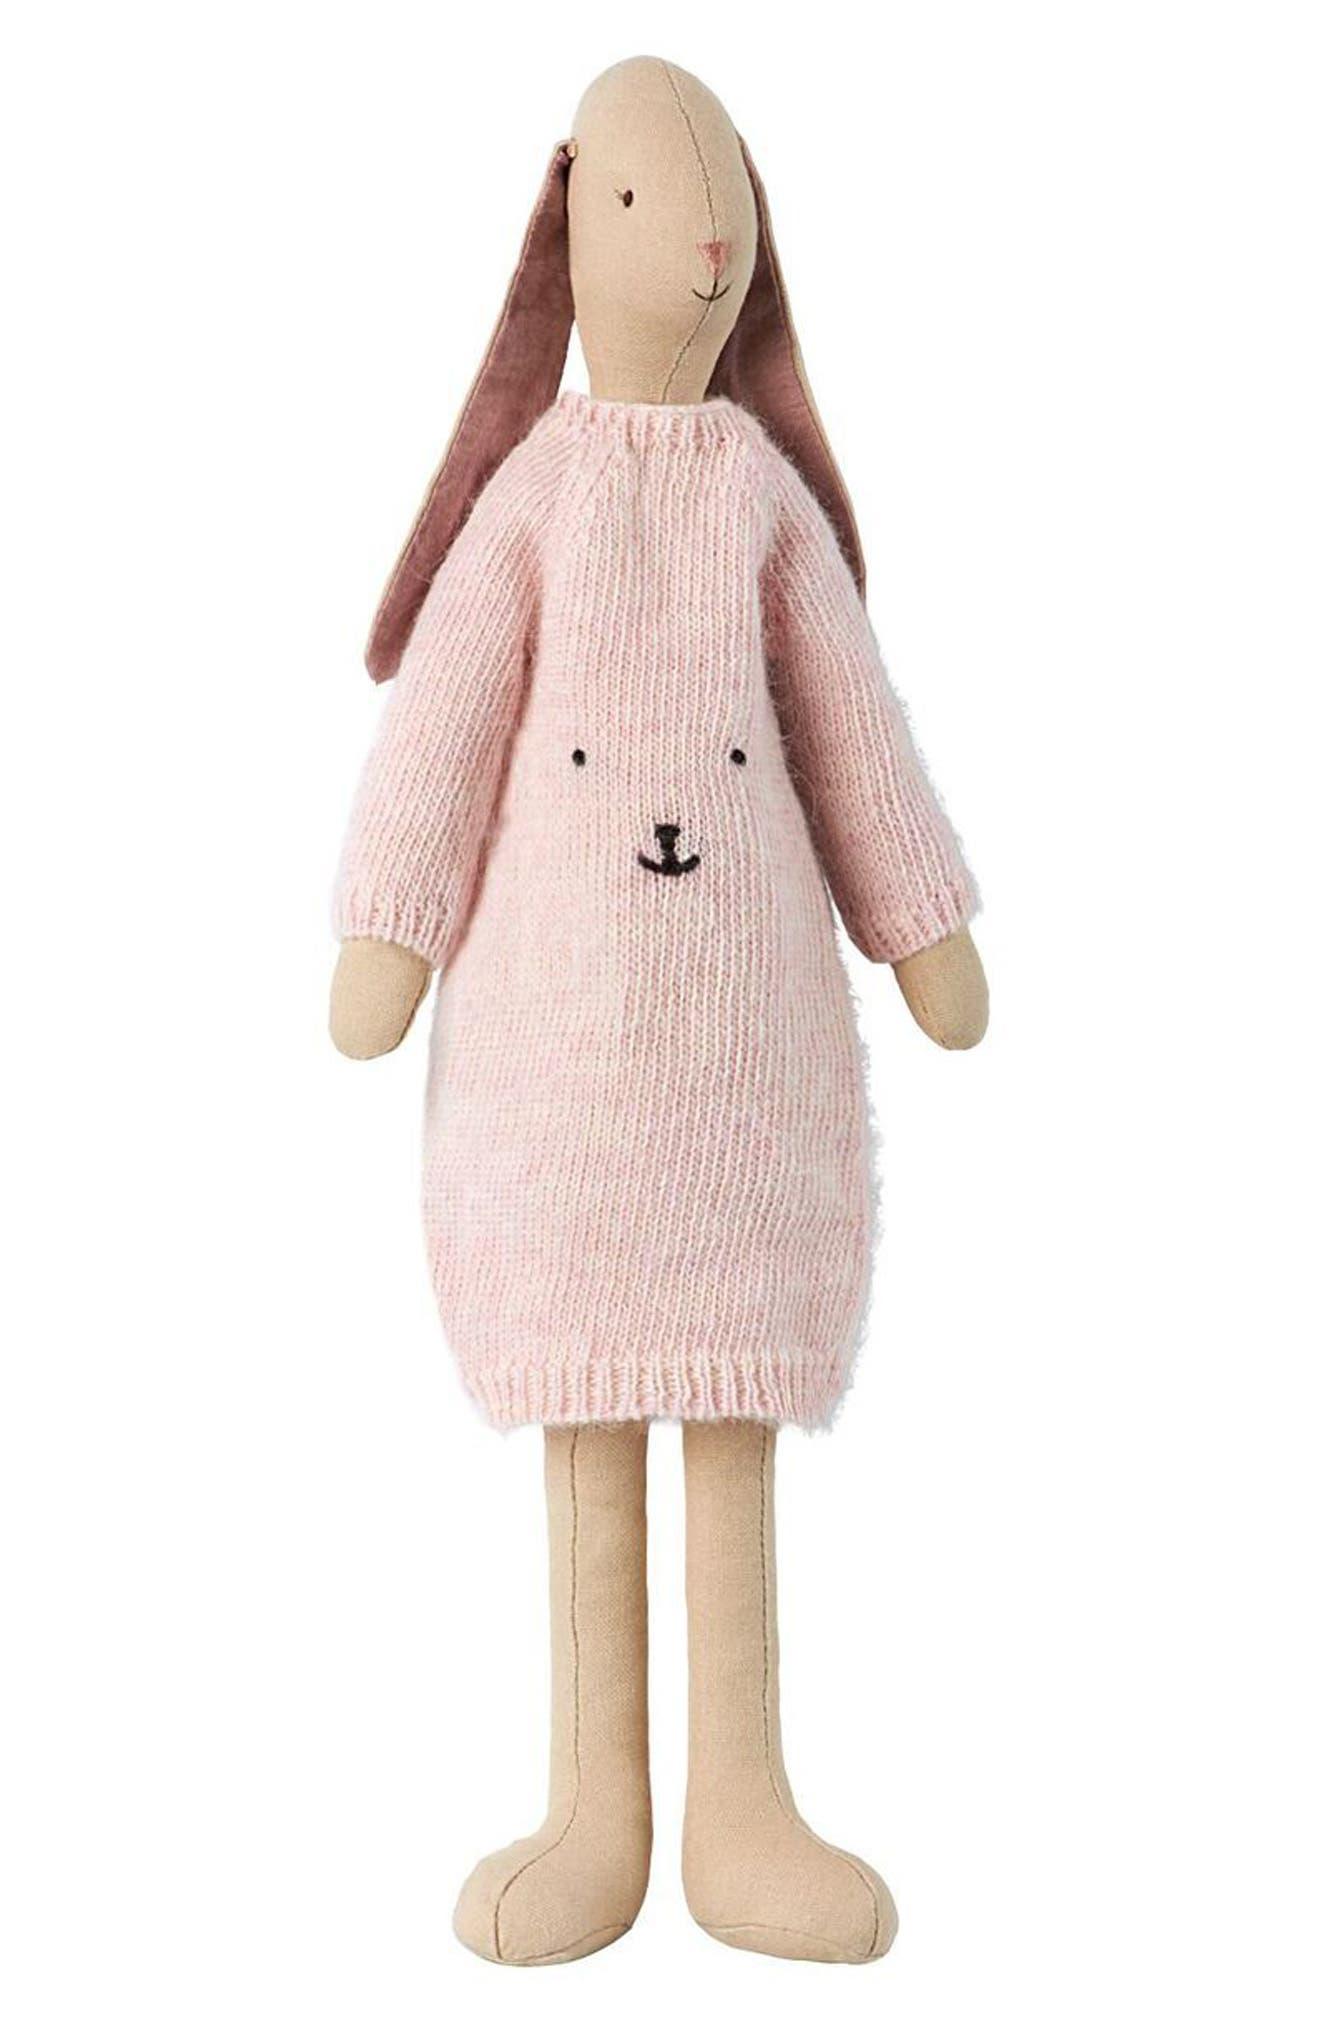 Sweater Bunny Stuffed Animal,                             Main thumbnail 1, color,                             MULTI